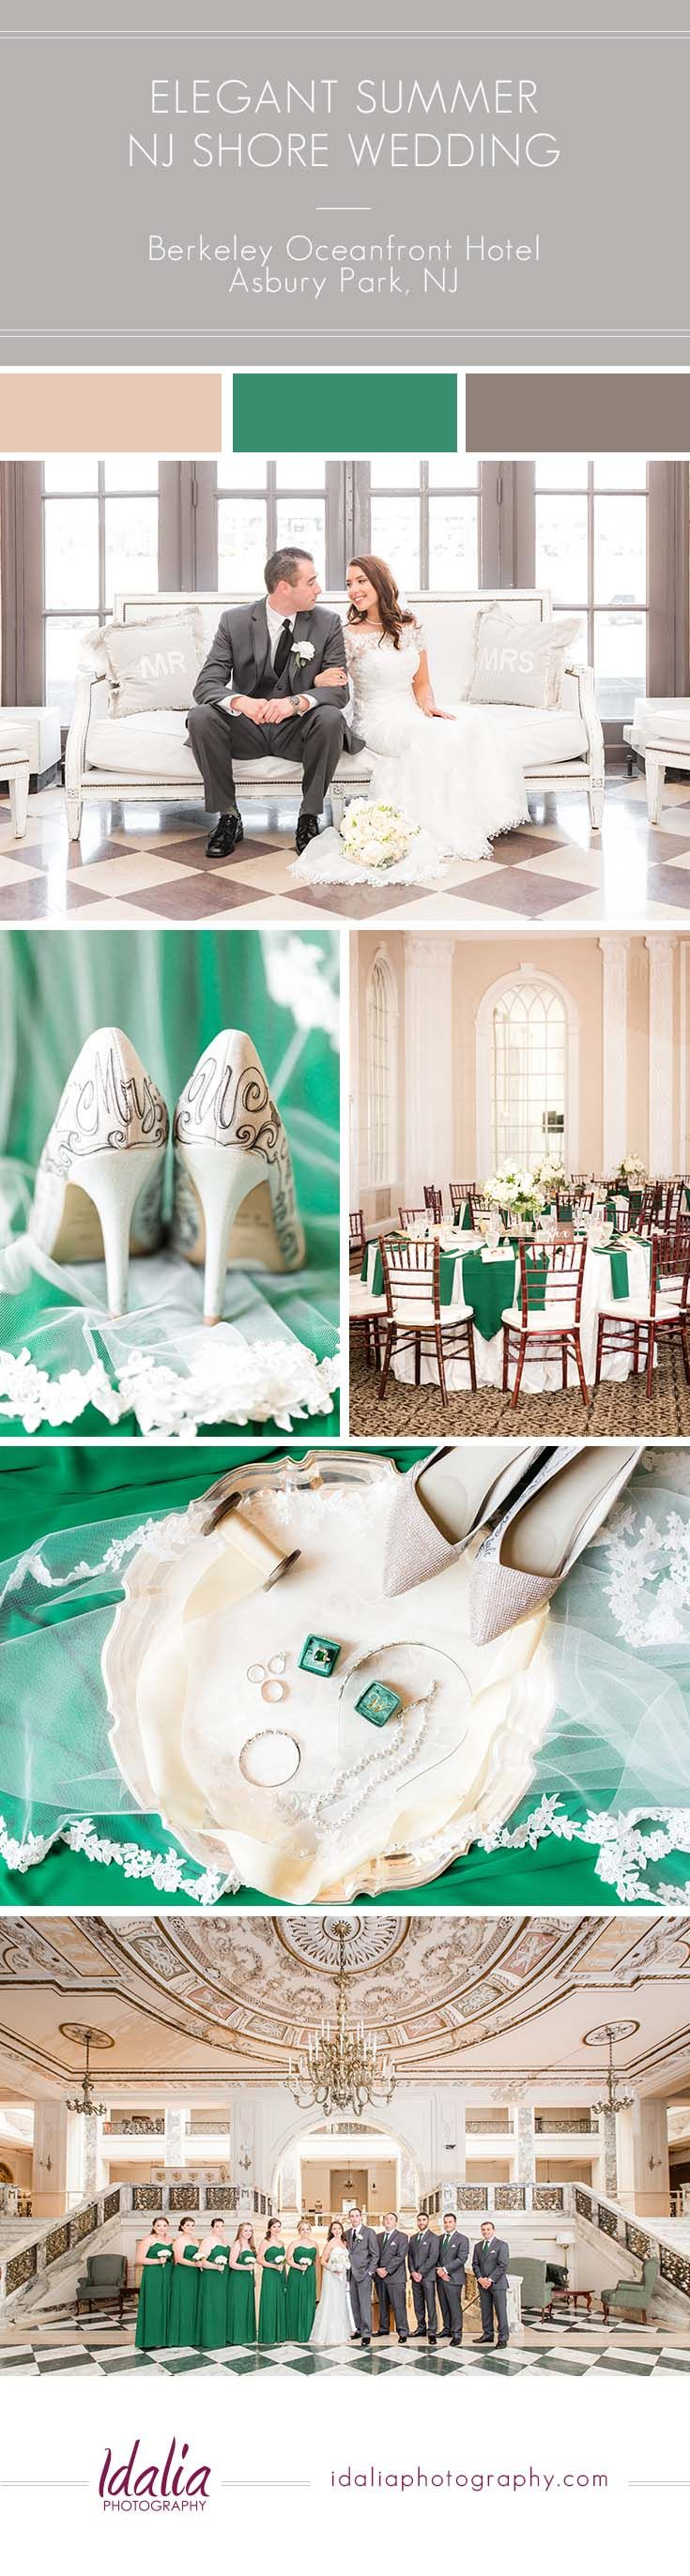 wedding venues asbury park nj%0A Berkeley Oceanfront Hotel Wedding Ideas   Photo by Idalia Photography